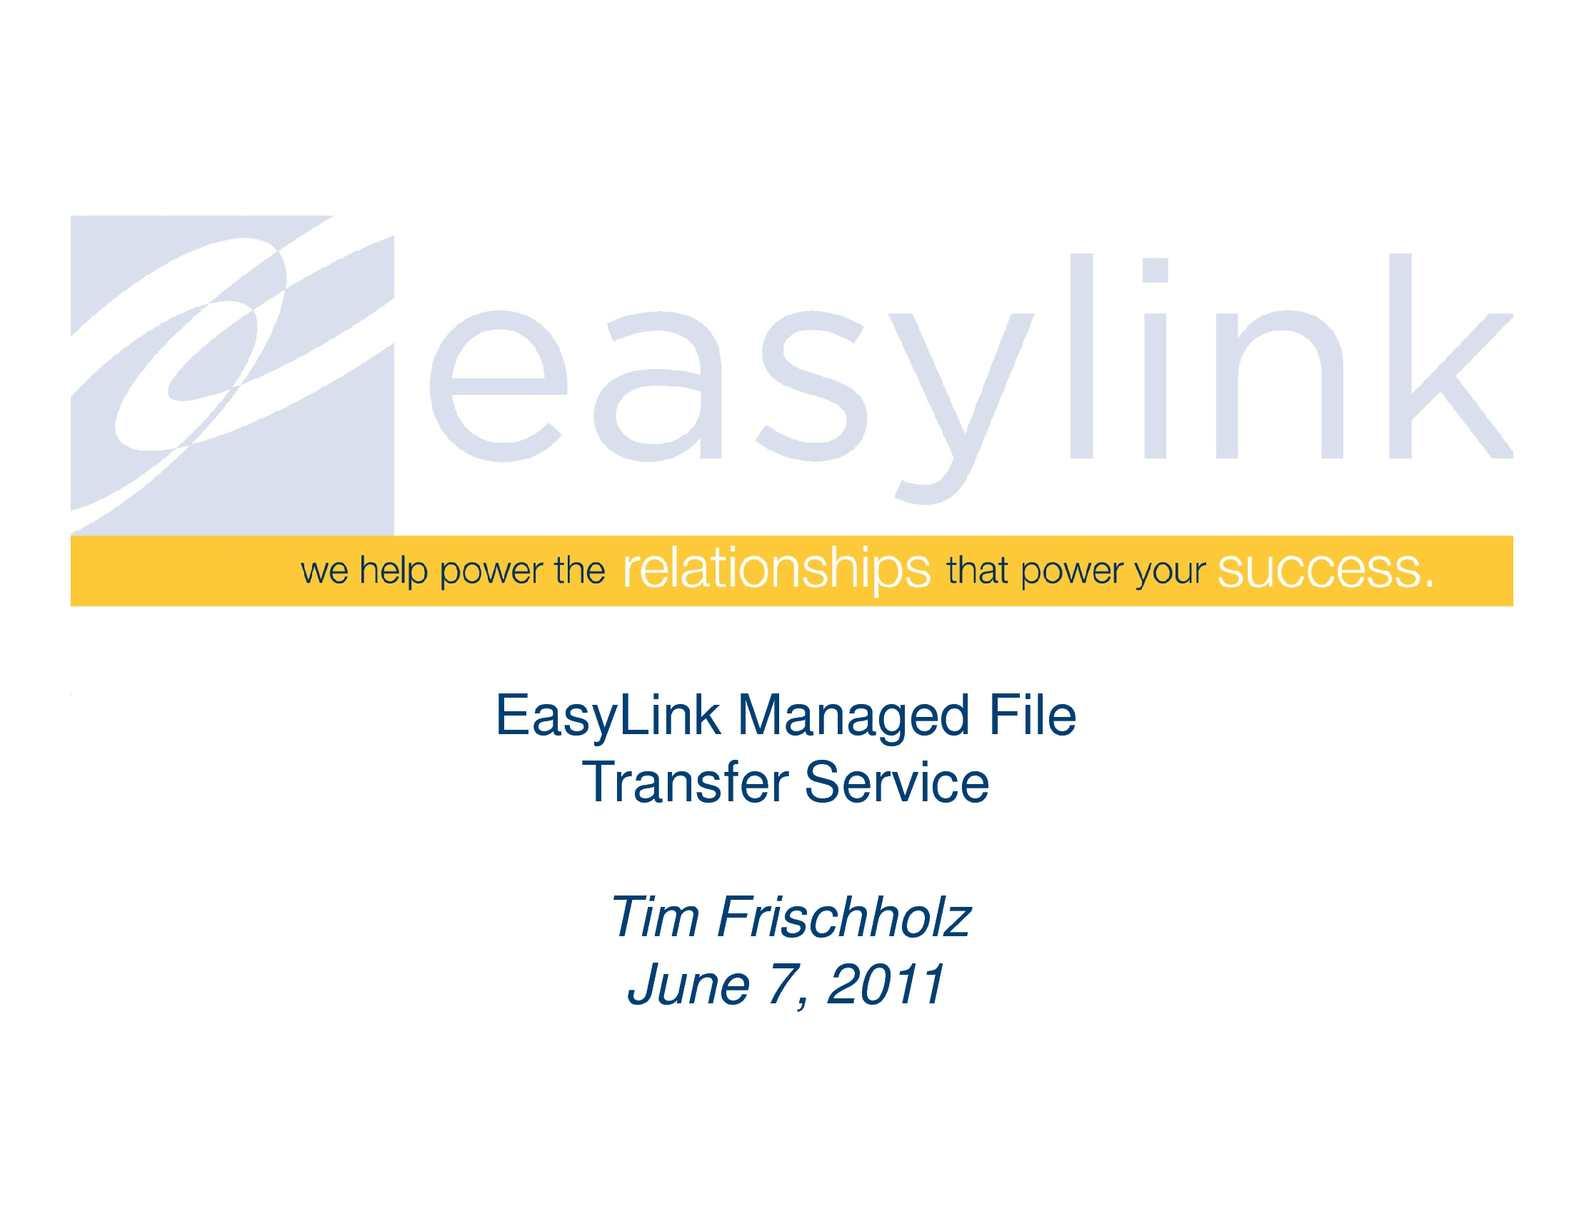 Calam 233 O Managed File Transfer Service Tfrischholz 062011